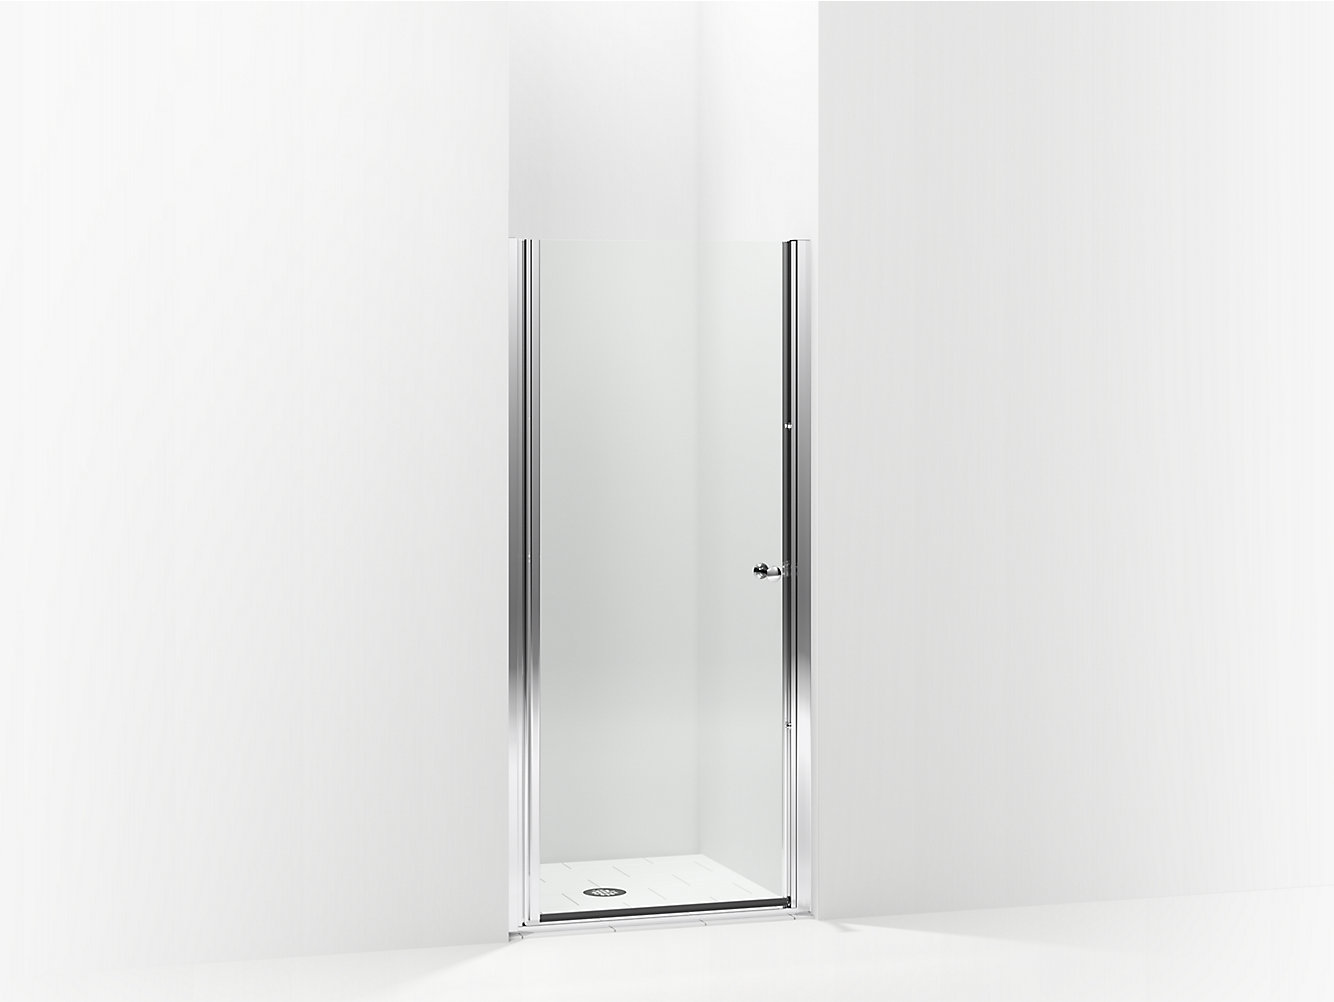 Finesse Frameless Swinging Shower Door 31 1432 34 W X 65 12 H